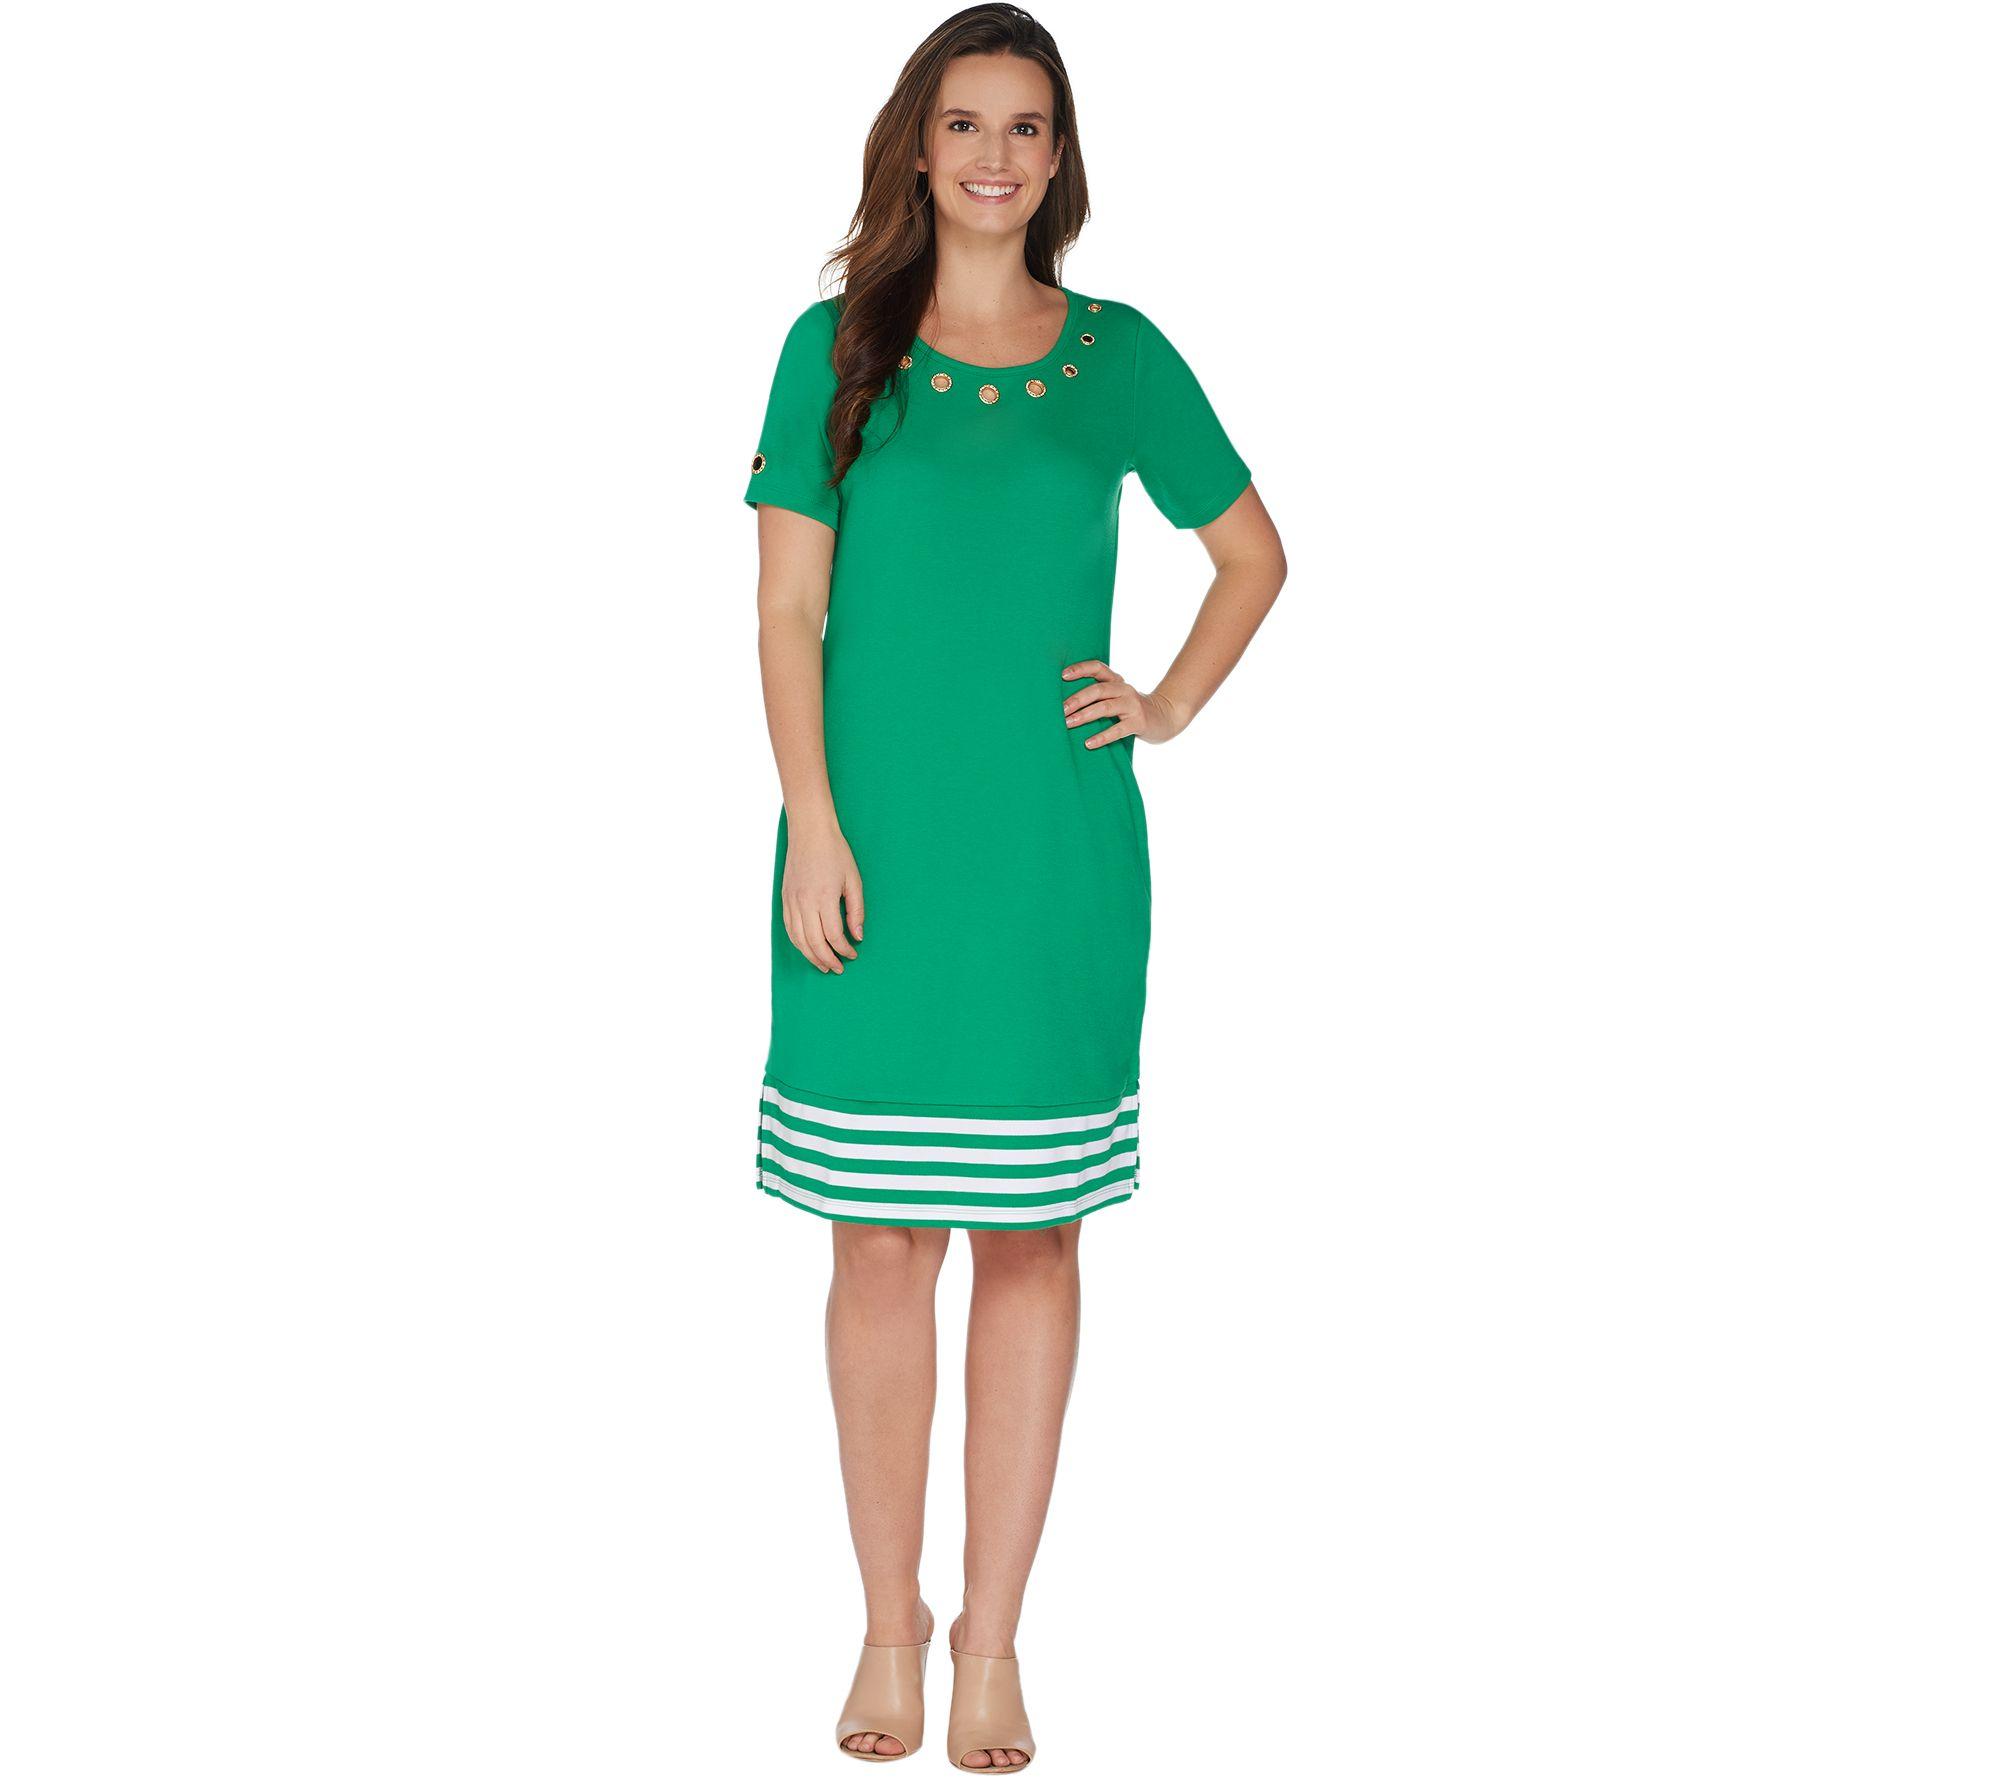 bfb880c55ef1 Quacker Factory Short Sleeve Striped Hem Knit Dress with Grommet Detail -  Page 1 — QVC.com